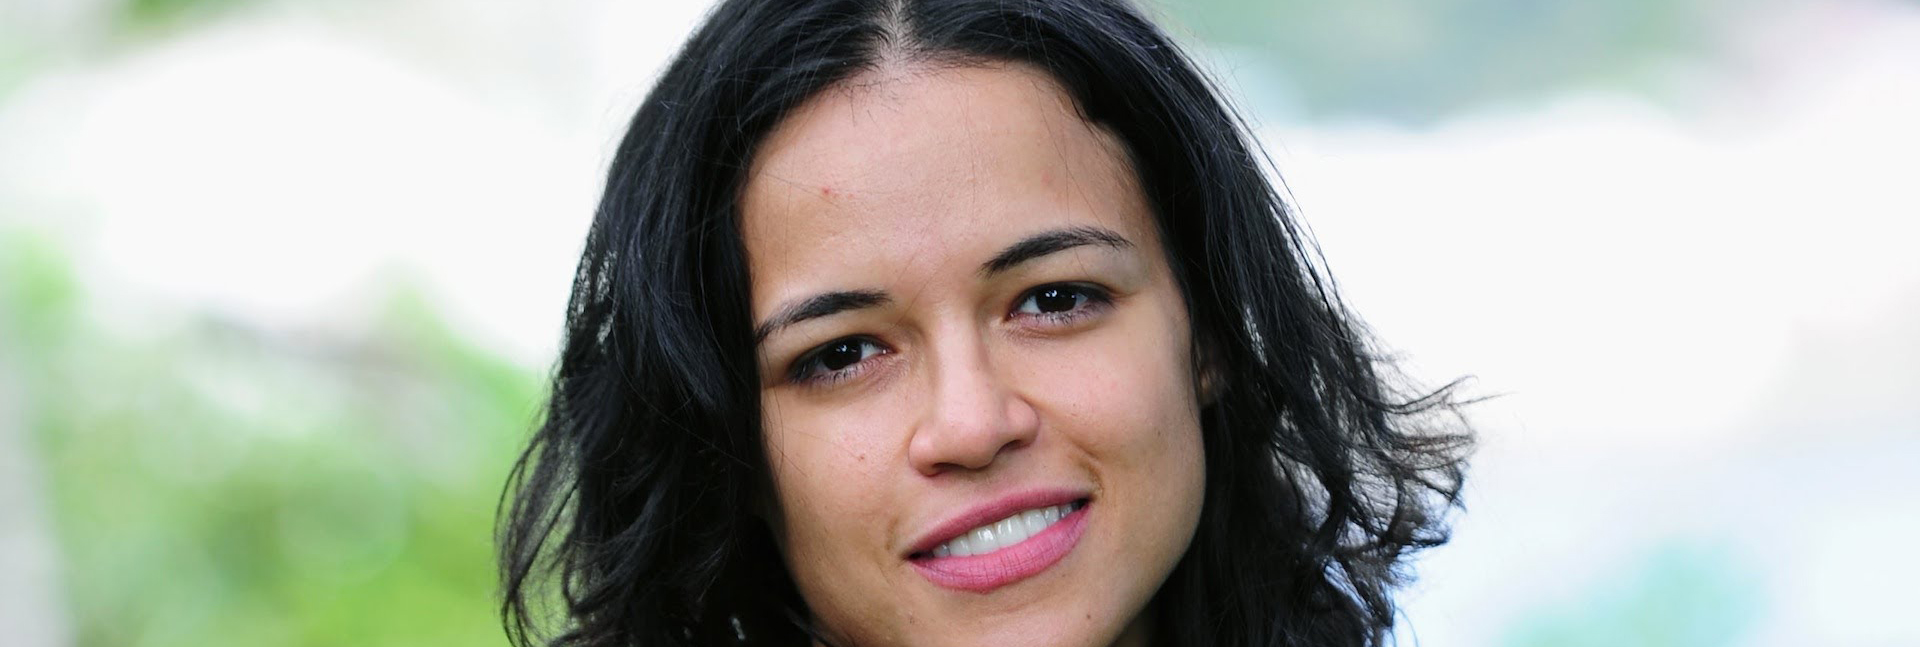 Michelle Rodriguez smiling